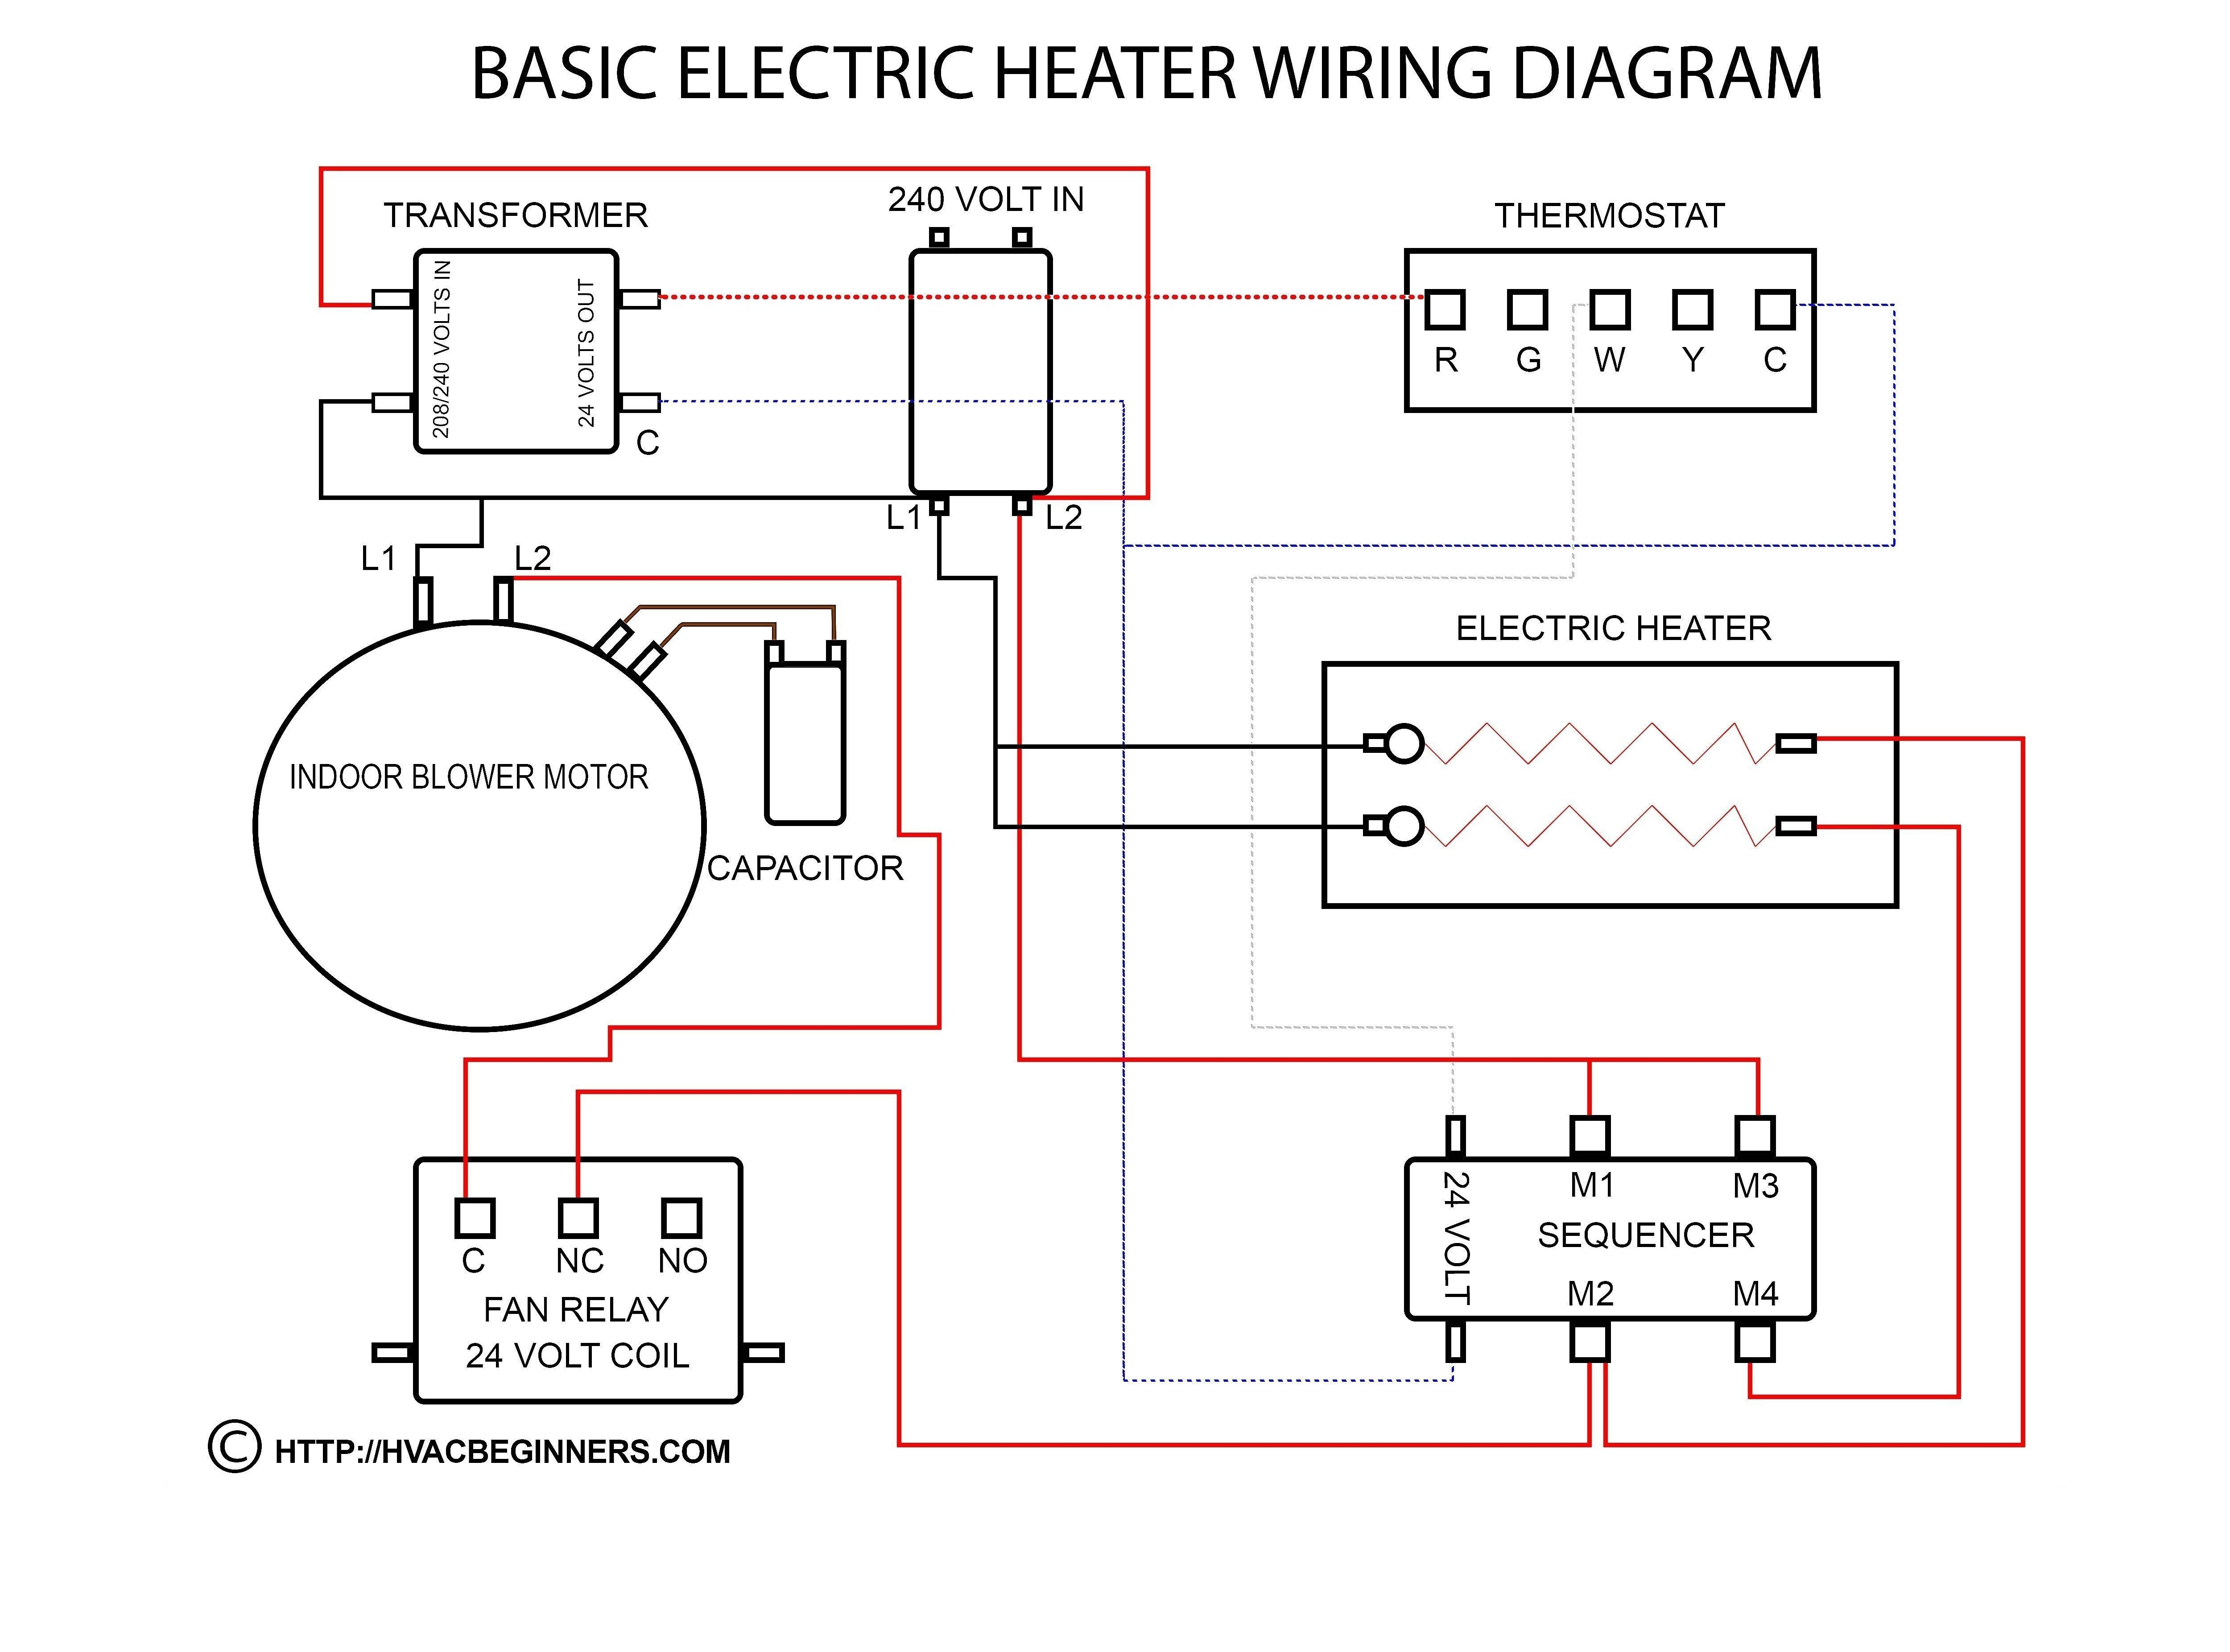 Elegant Furnace Transformer Wiring Diagram in 2020 | Electrical circuit  diagram, Basic electrical wiring, Electrical diagramPinterest